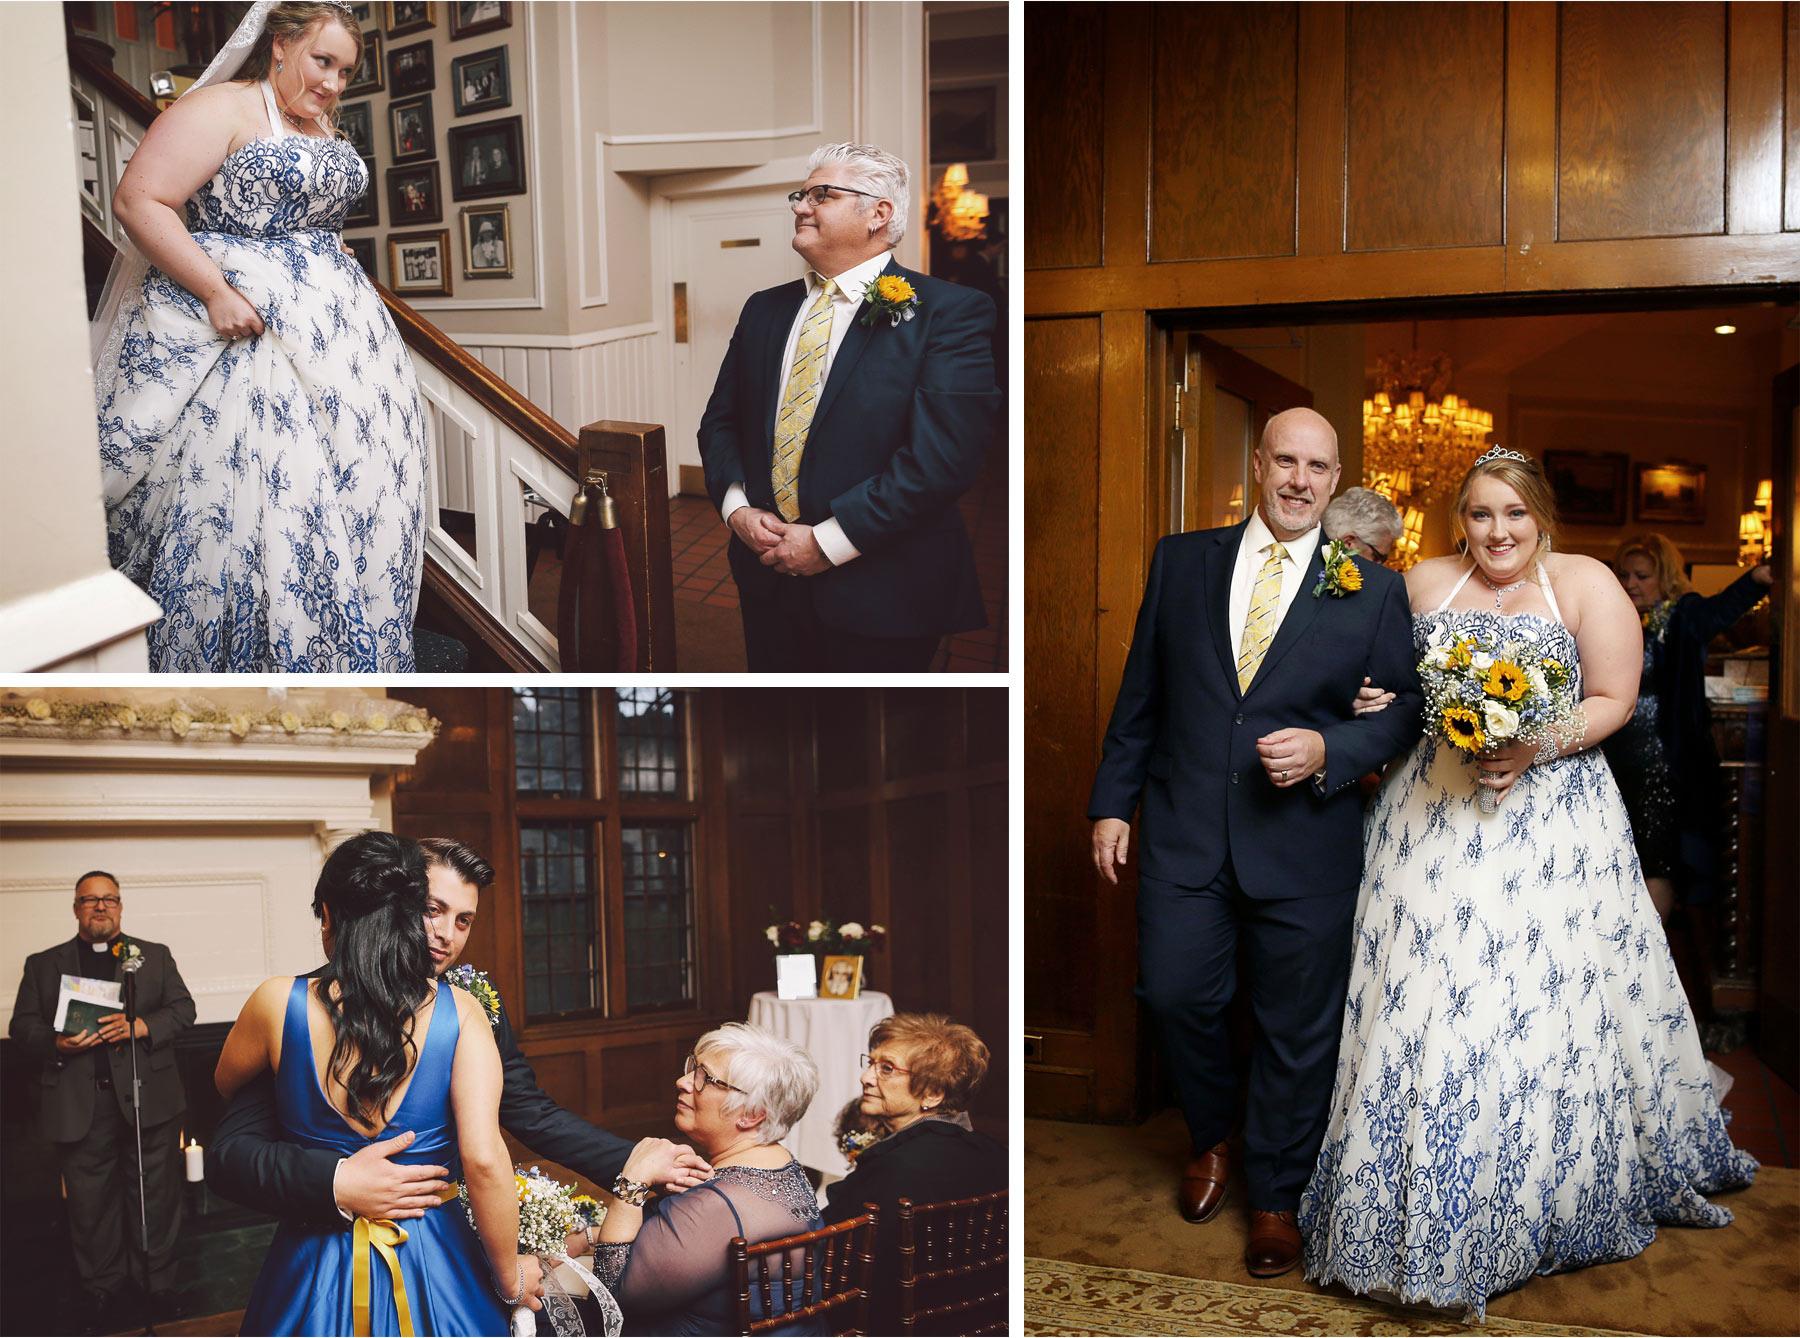 06-Saint-Paul-Minnesota-Wedding-Photography-by-Vick-Photography-The-University-Club-Ceremony-Mari-and-Giuseppe.jpg